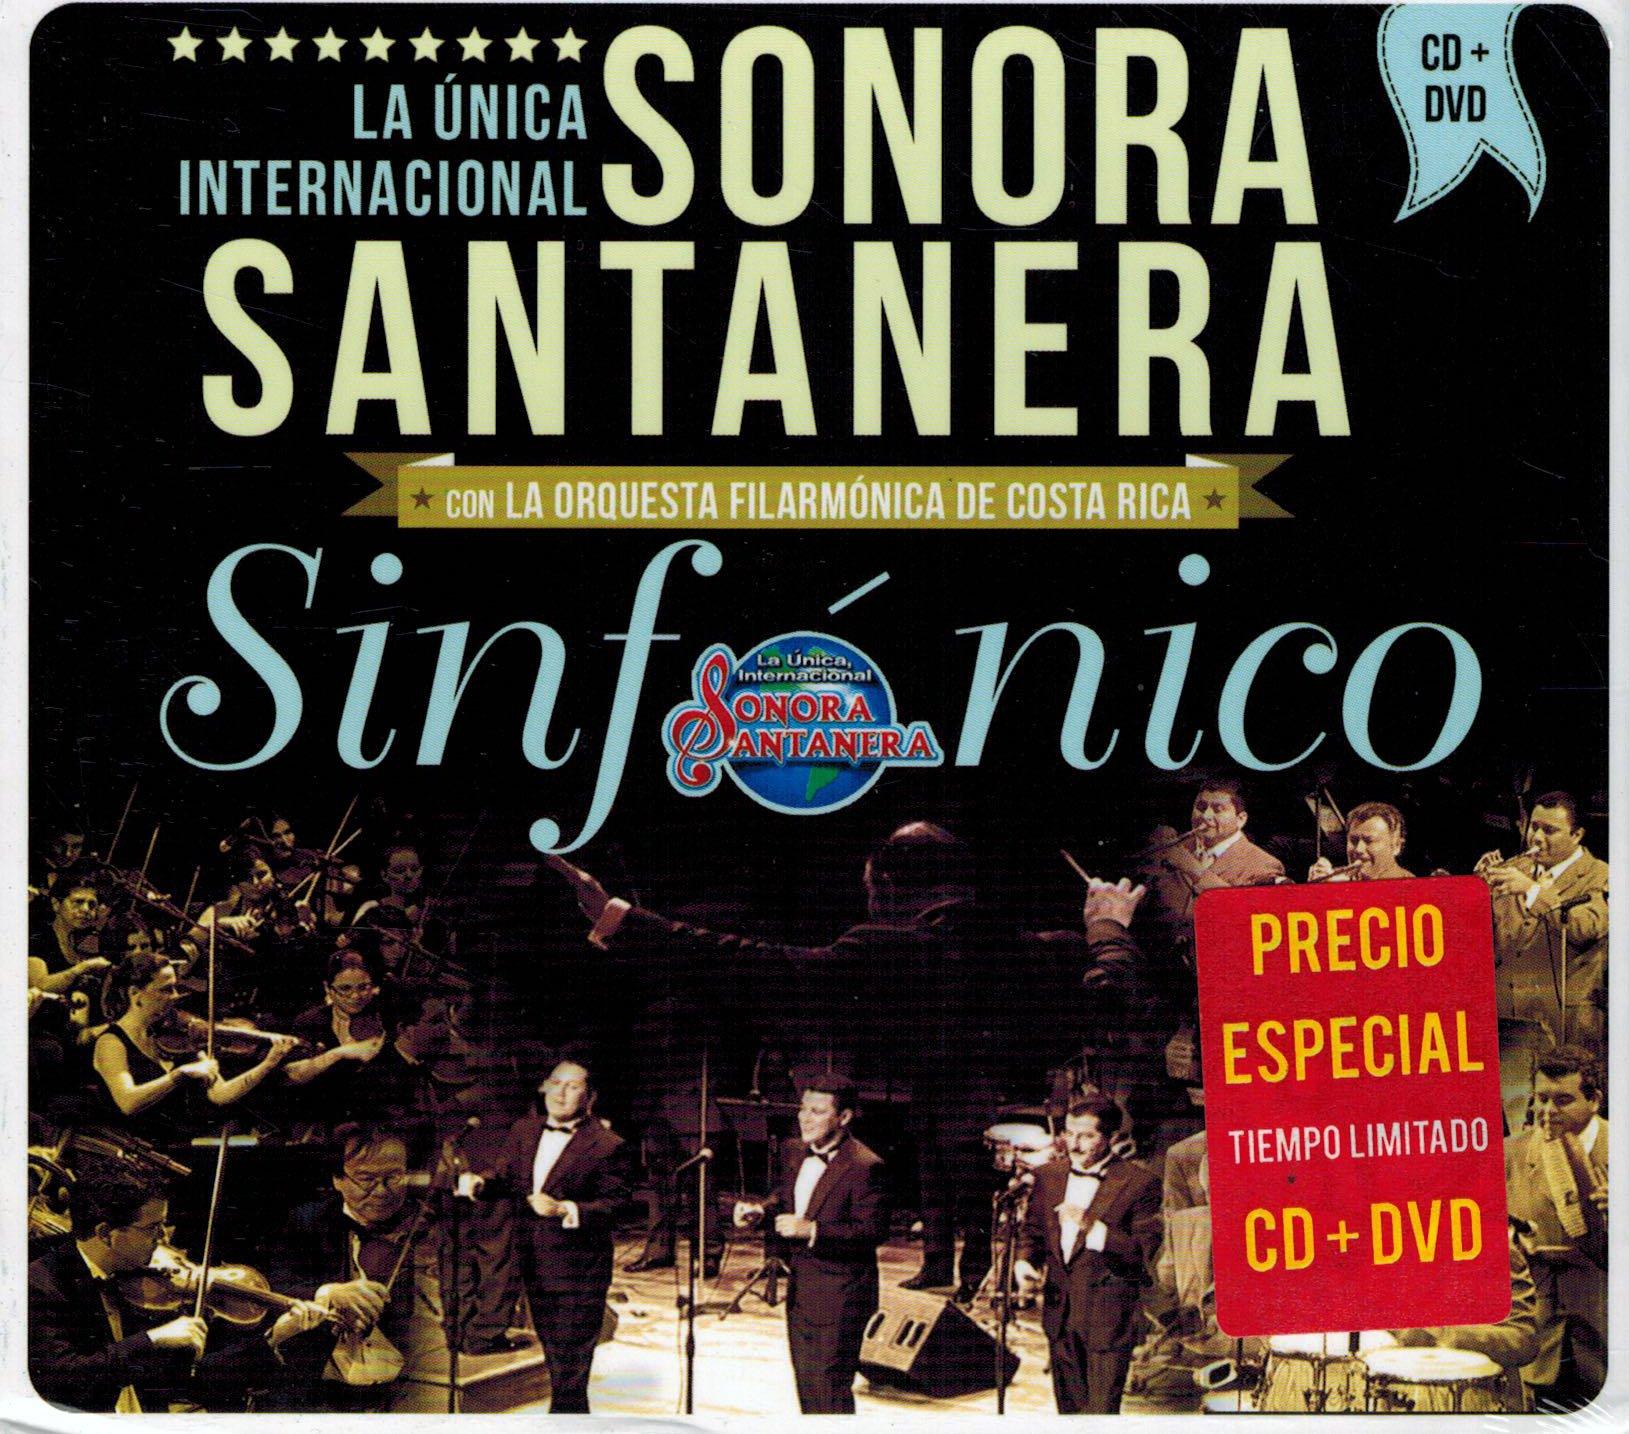 Sonora Santanera, La Unica Internacional (Sinfonico En Vivo - Con La Orquesta Filarmonica de Costa Rica Cd+Dvd Universal-086294) by Universal